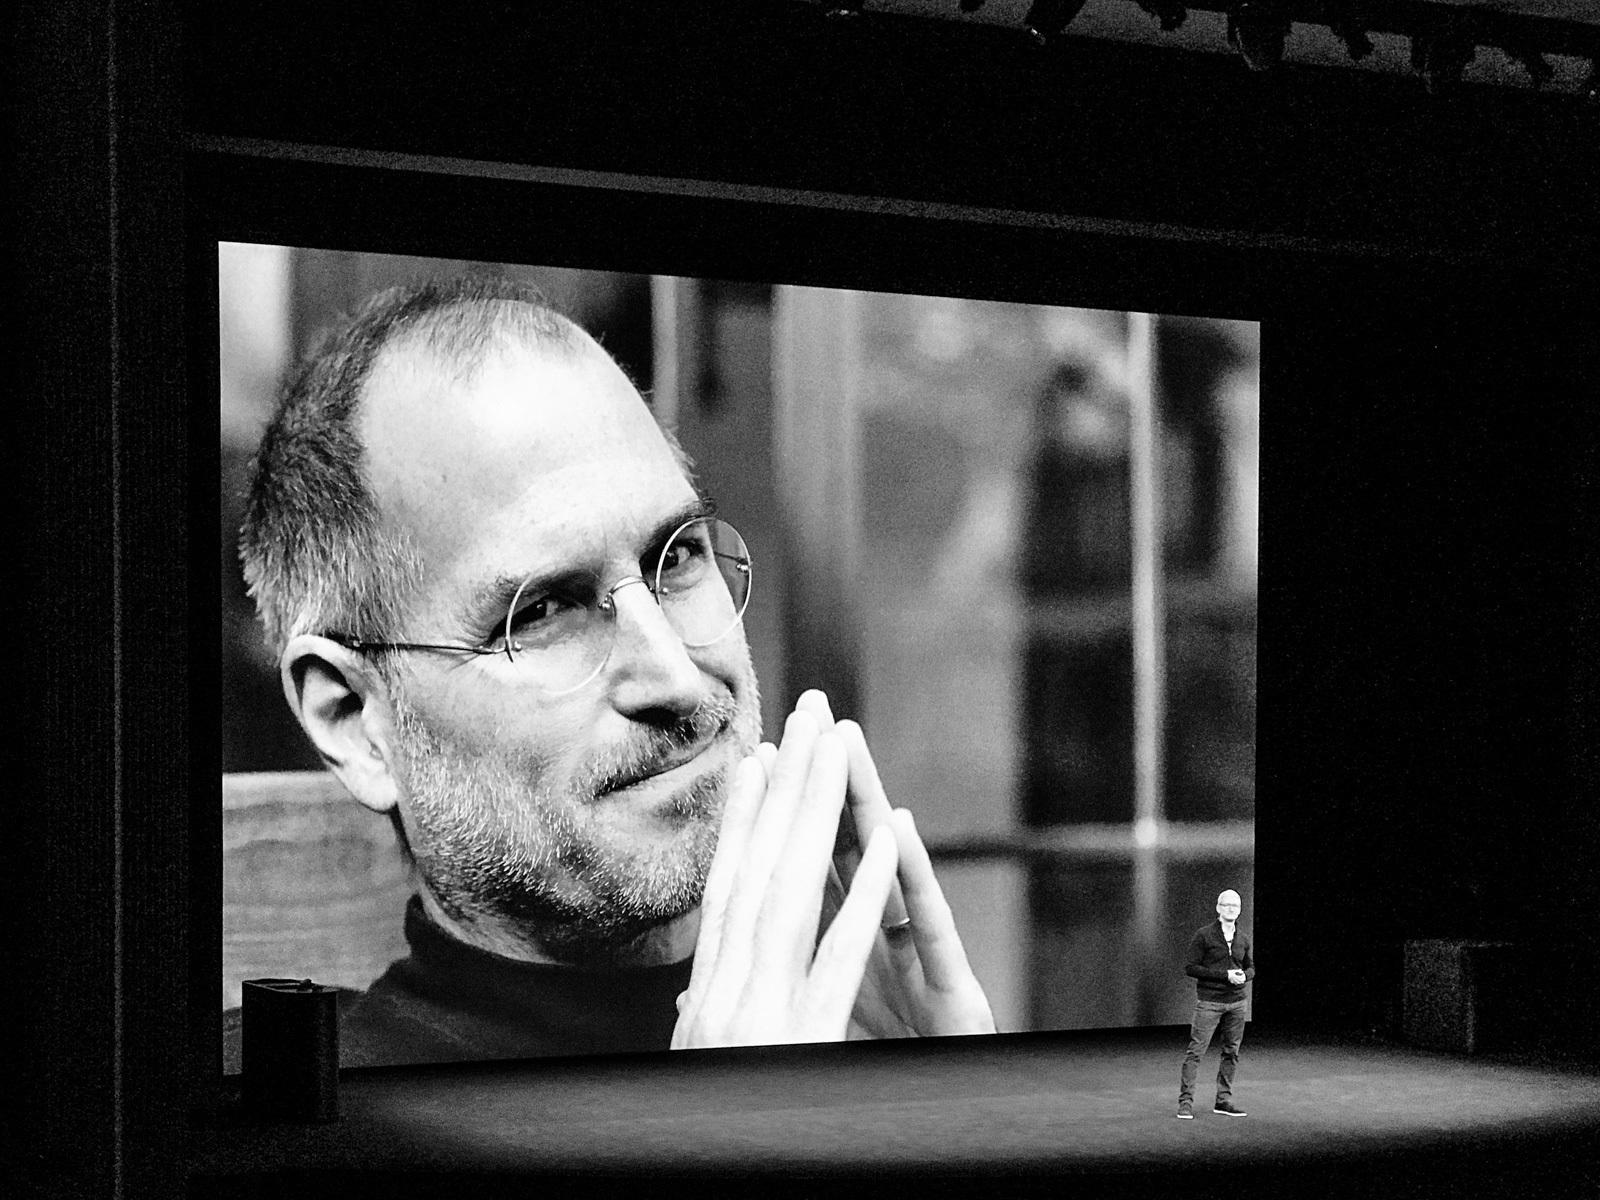 large_apple-steve-jobs-theater-5.jpg